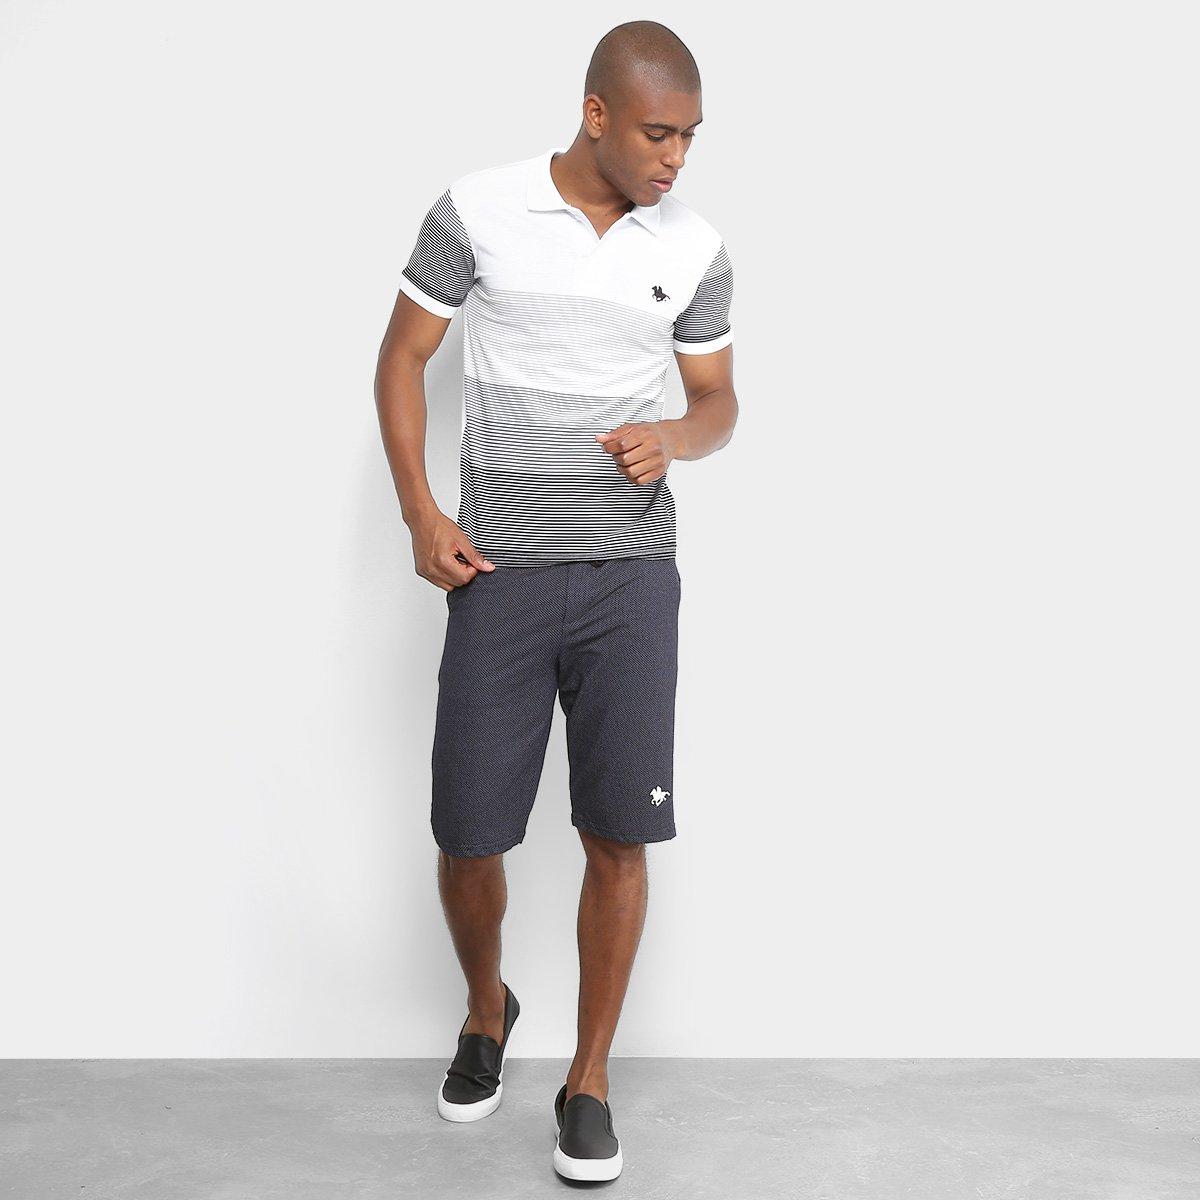 Camisa Polo RG 518 Listrada Degrade Masculina - Branco - Compre ... f71156267d36c